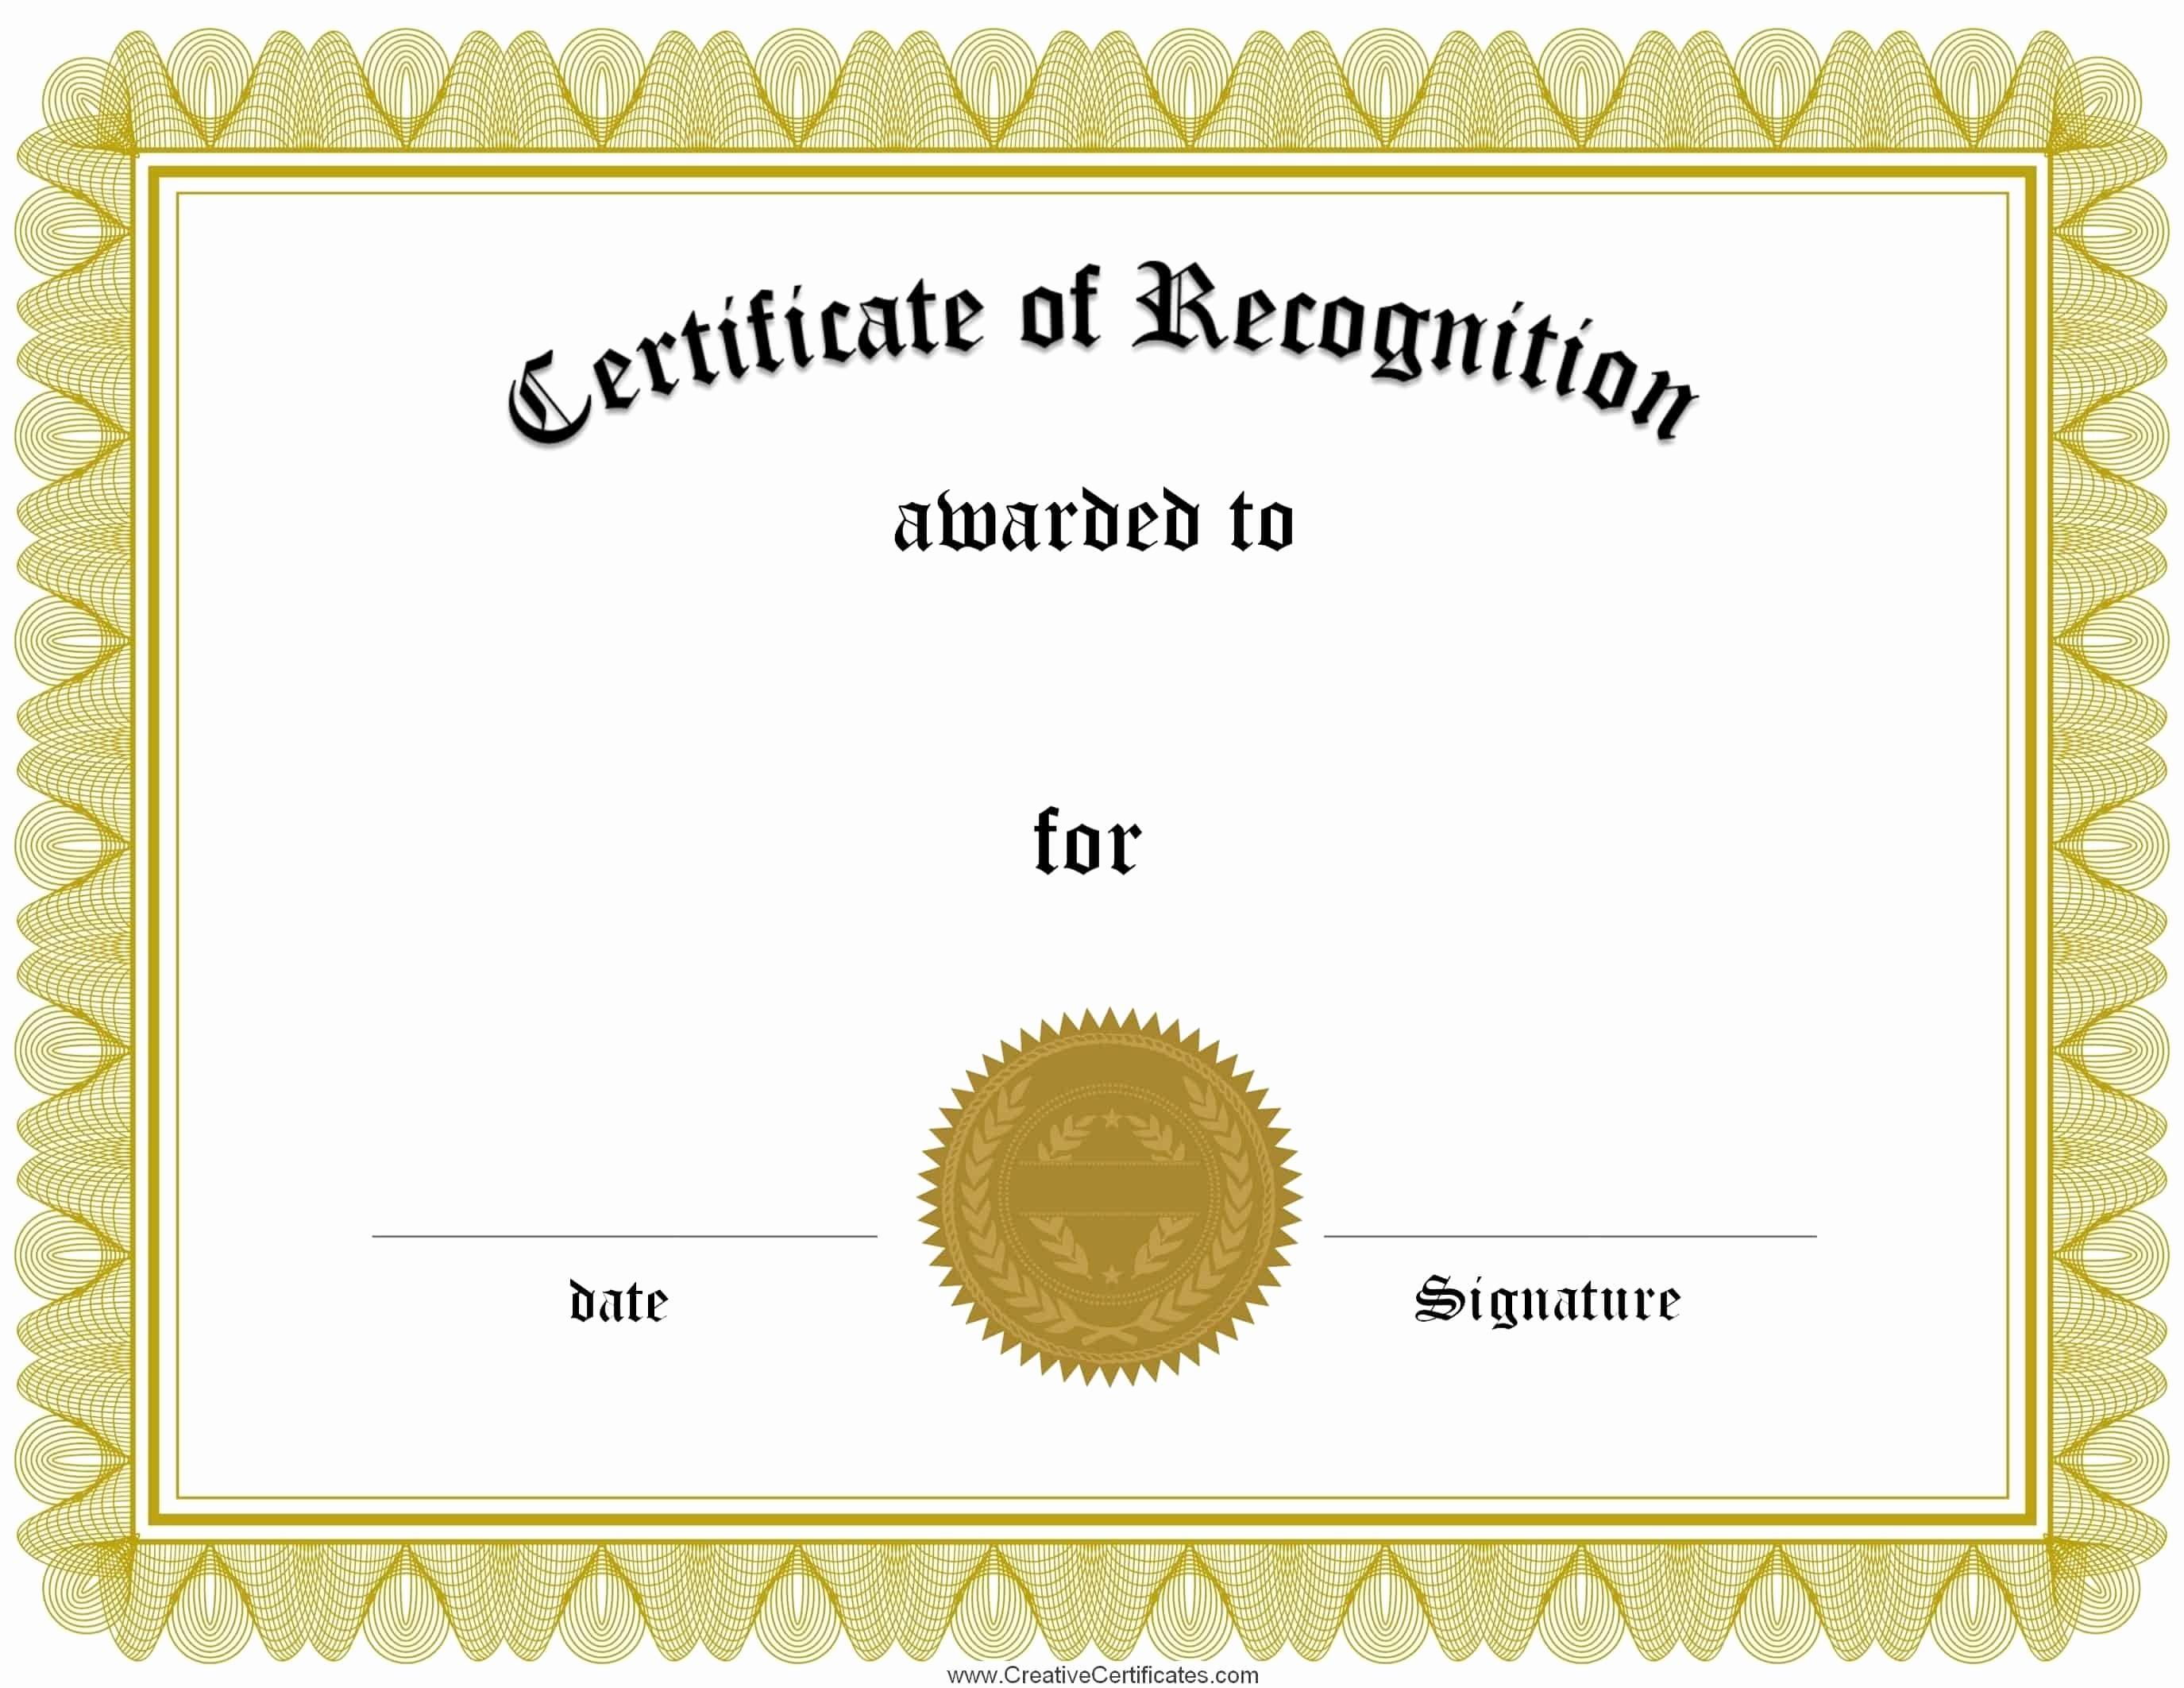 Template for Certificate Of Appreciation Lovely Free Certificate Of Recognition Template